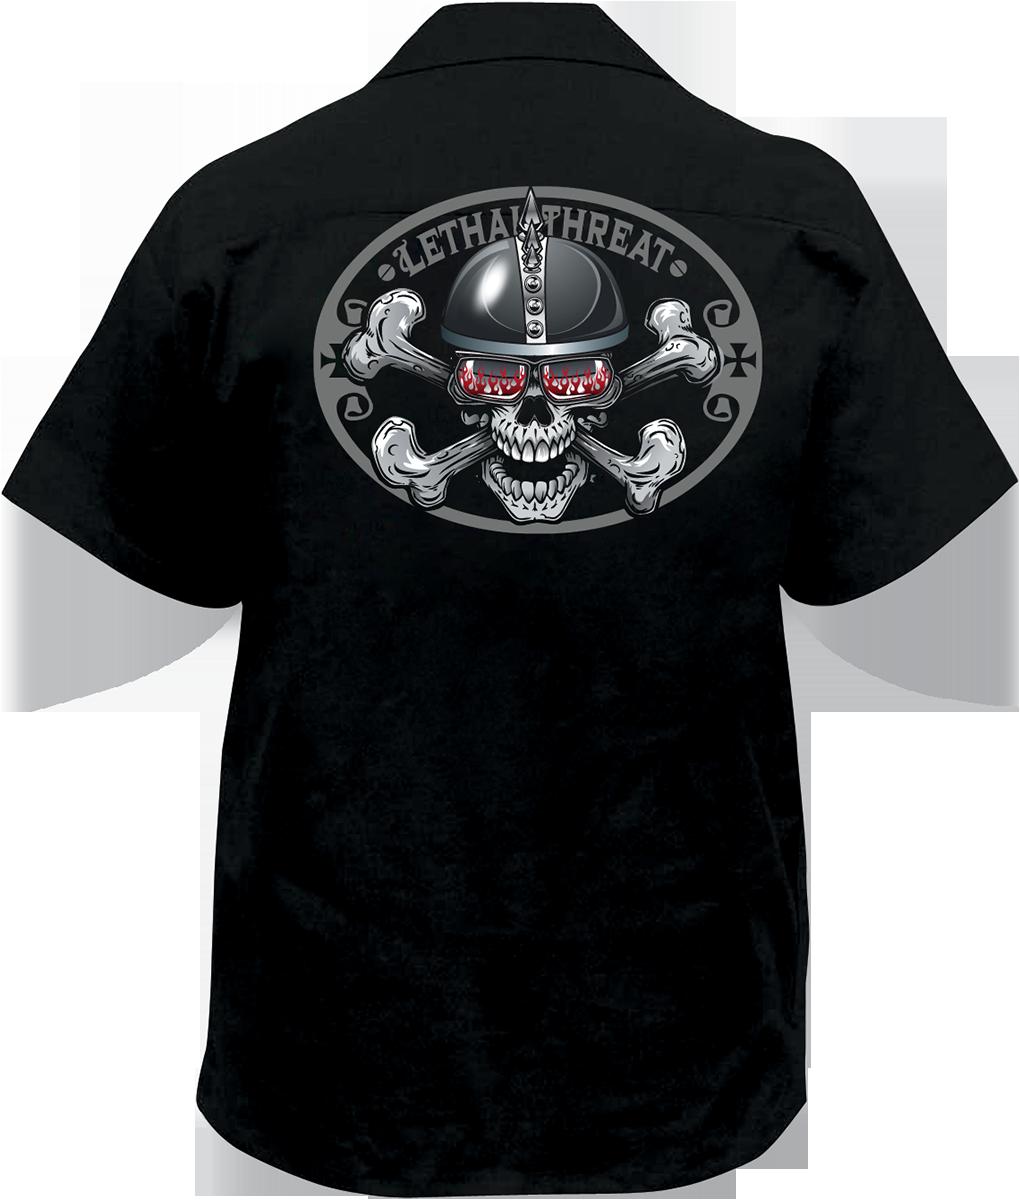 Lethal threat spiked helmet skull embroidered biker work shirt for Embroidered work shirts online